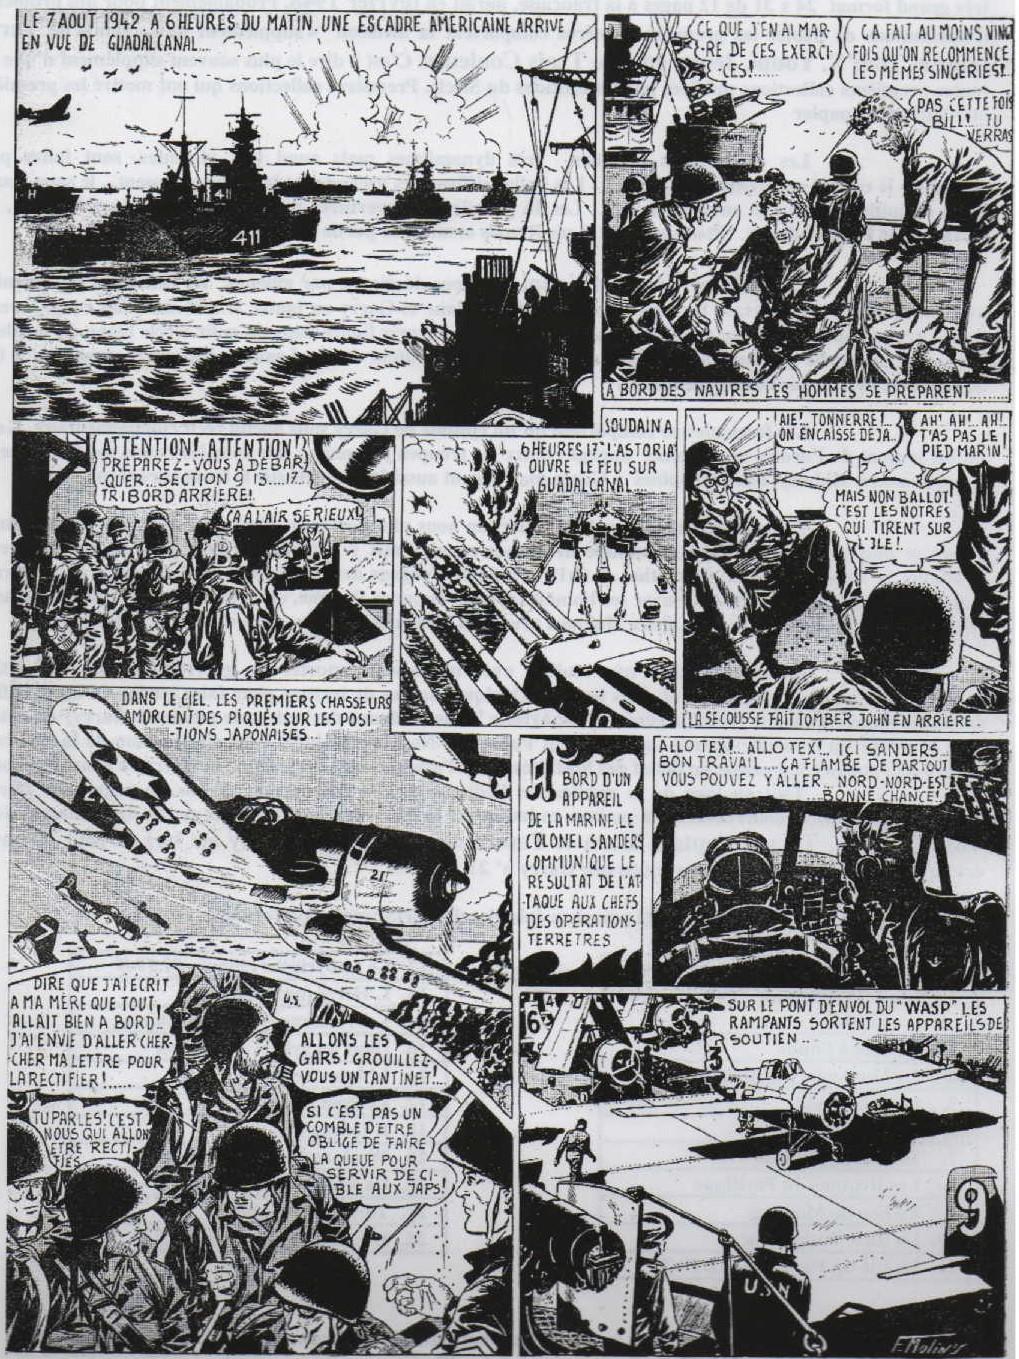 « Garry » premier épisode  Garry n° 1 (20/02/1948).